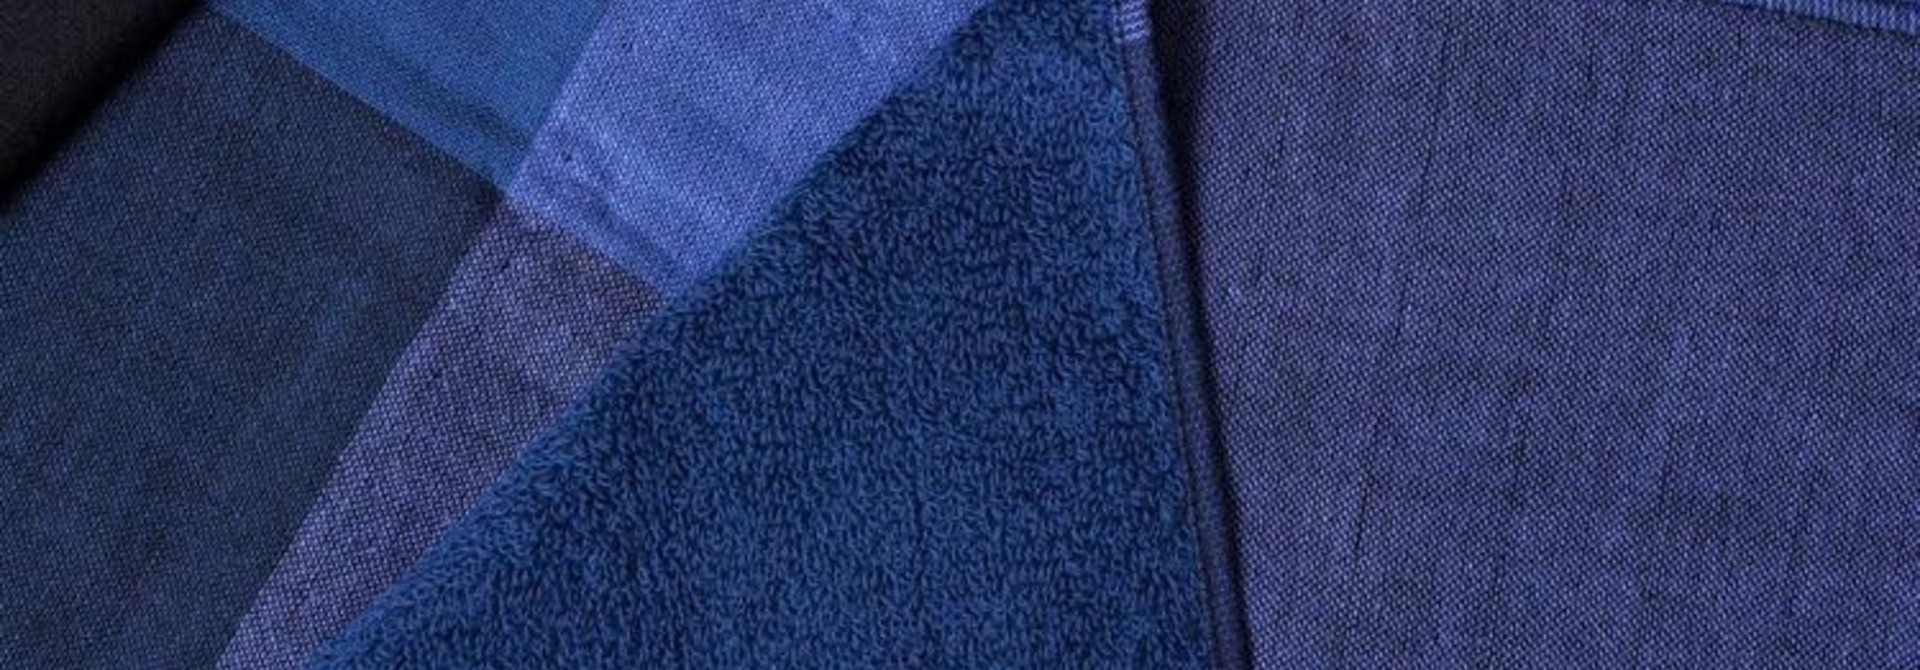 Bath Towel - Chambray - Blue